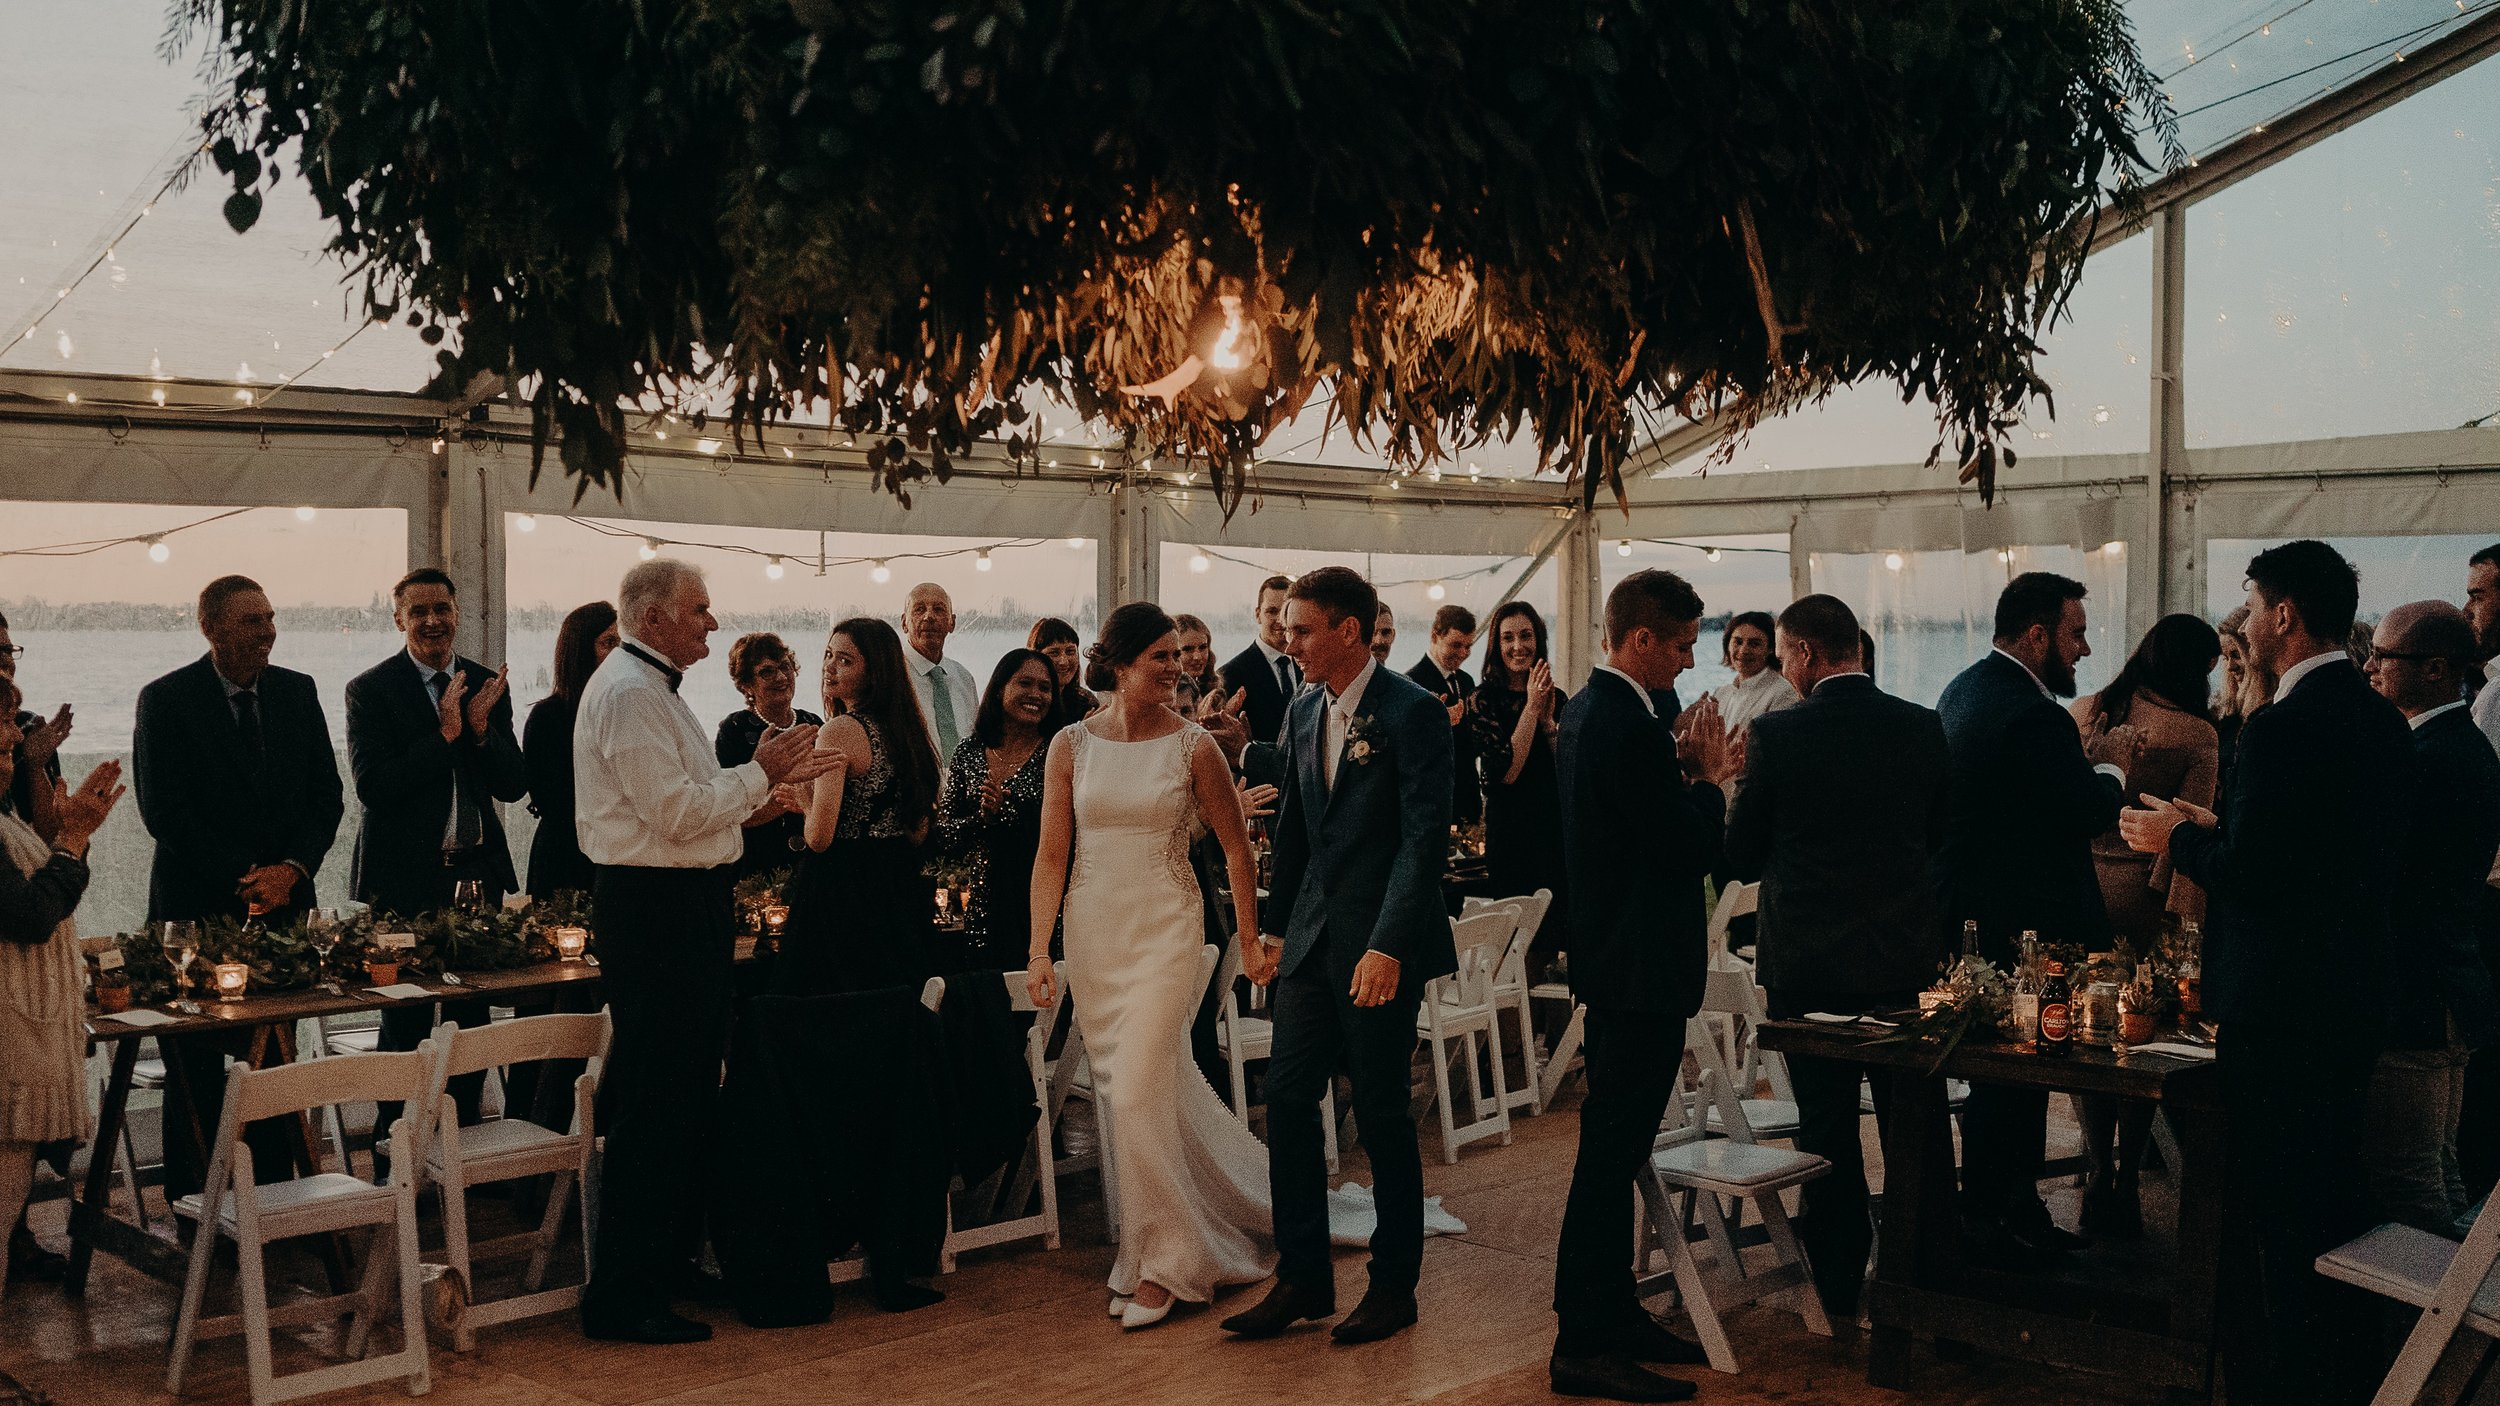 mickalathomas_puremacphotography_weddingphotographer_couplephotographer_Sheppartonphotographer_2587.jpg